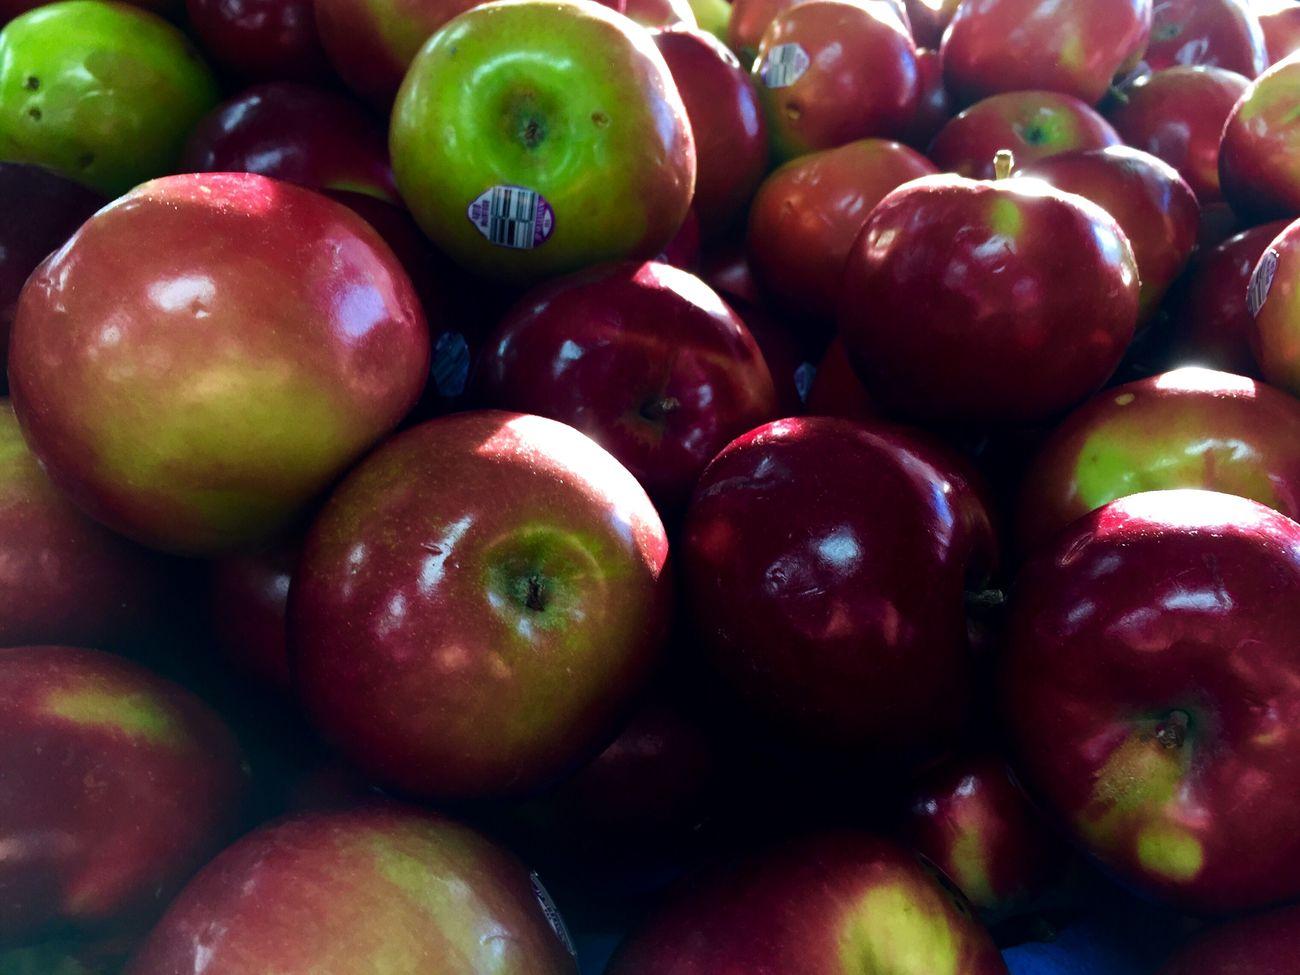 Apples (the fruit, non-tech). Fruit Fresh Produce